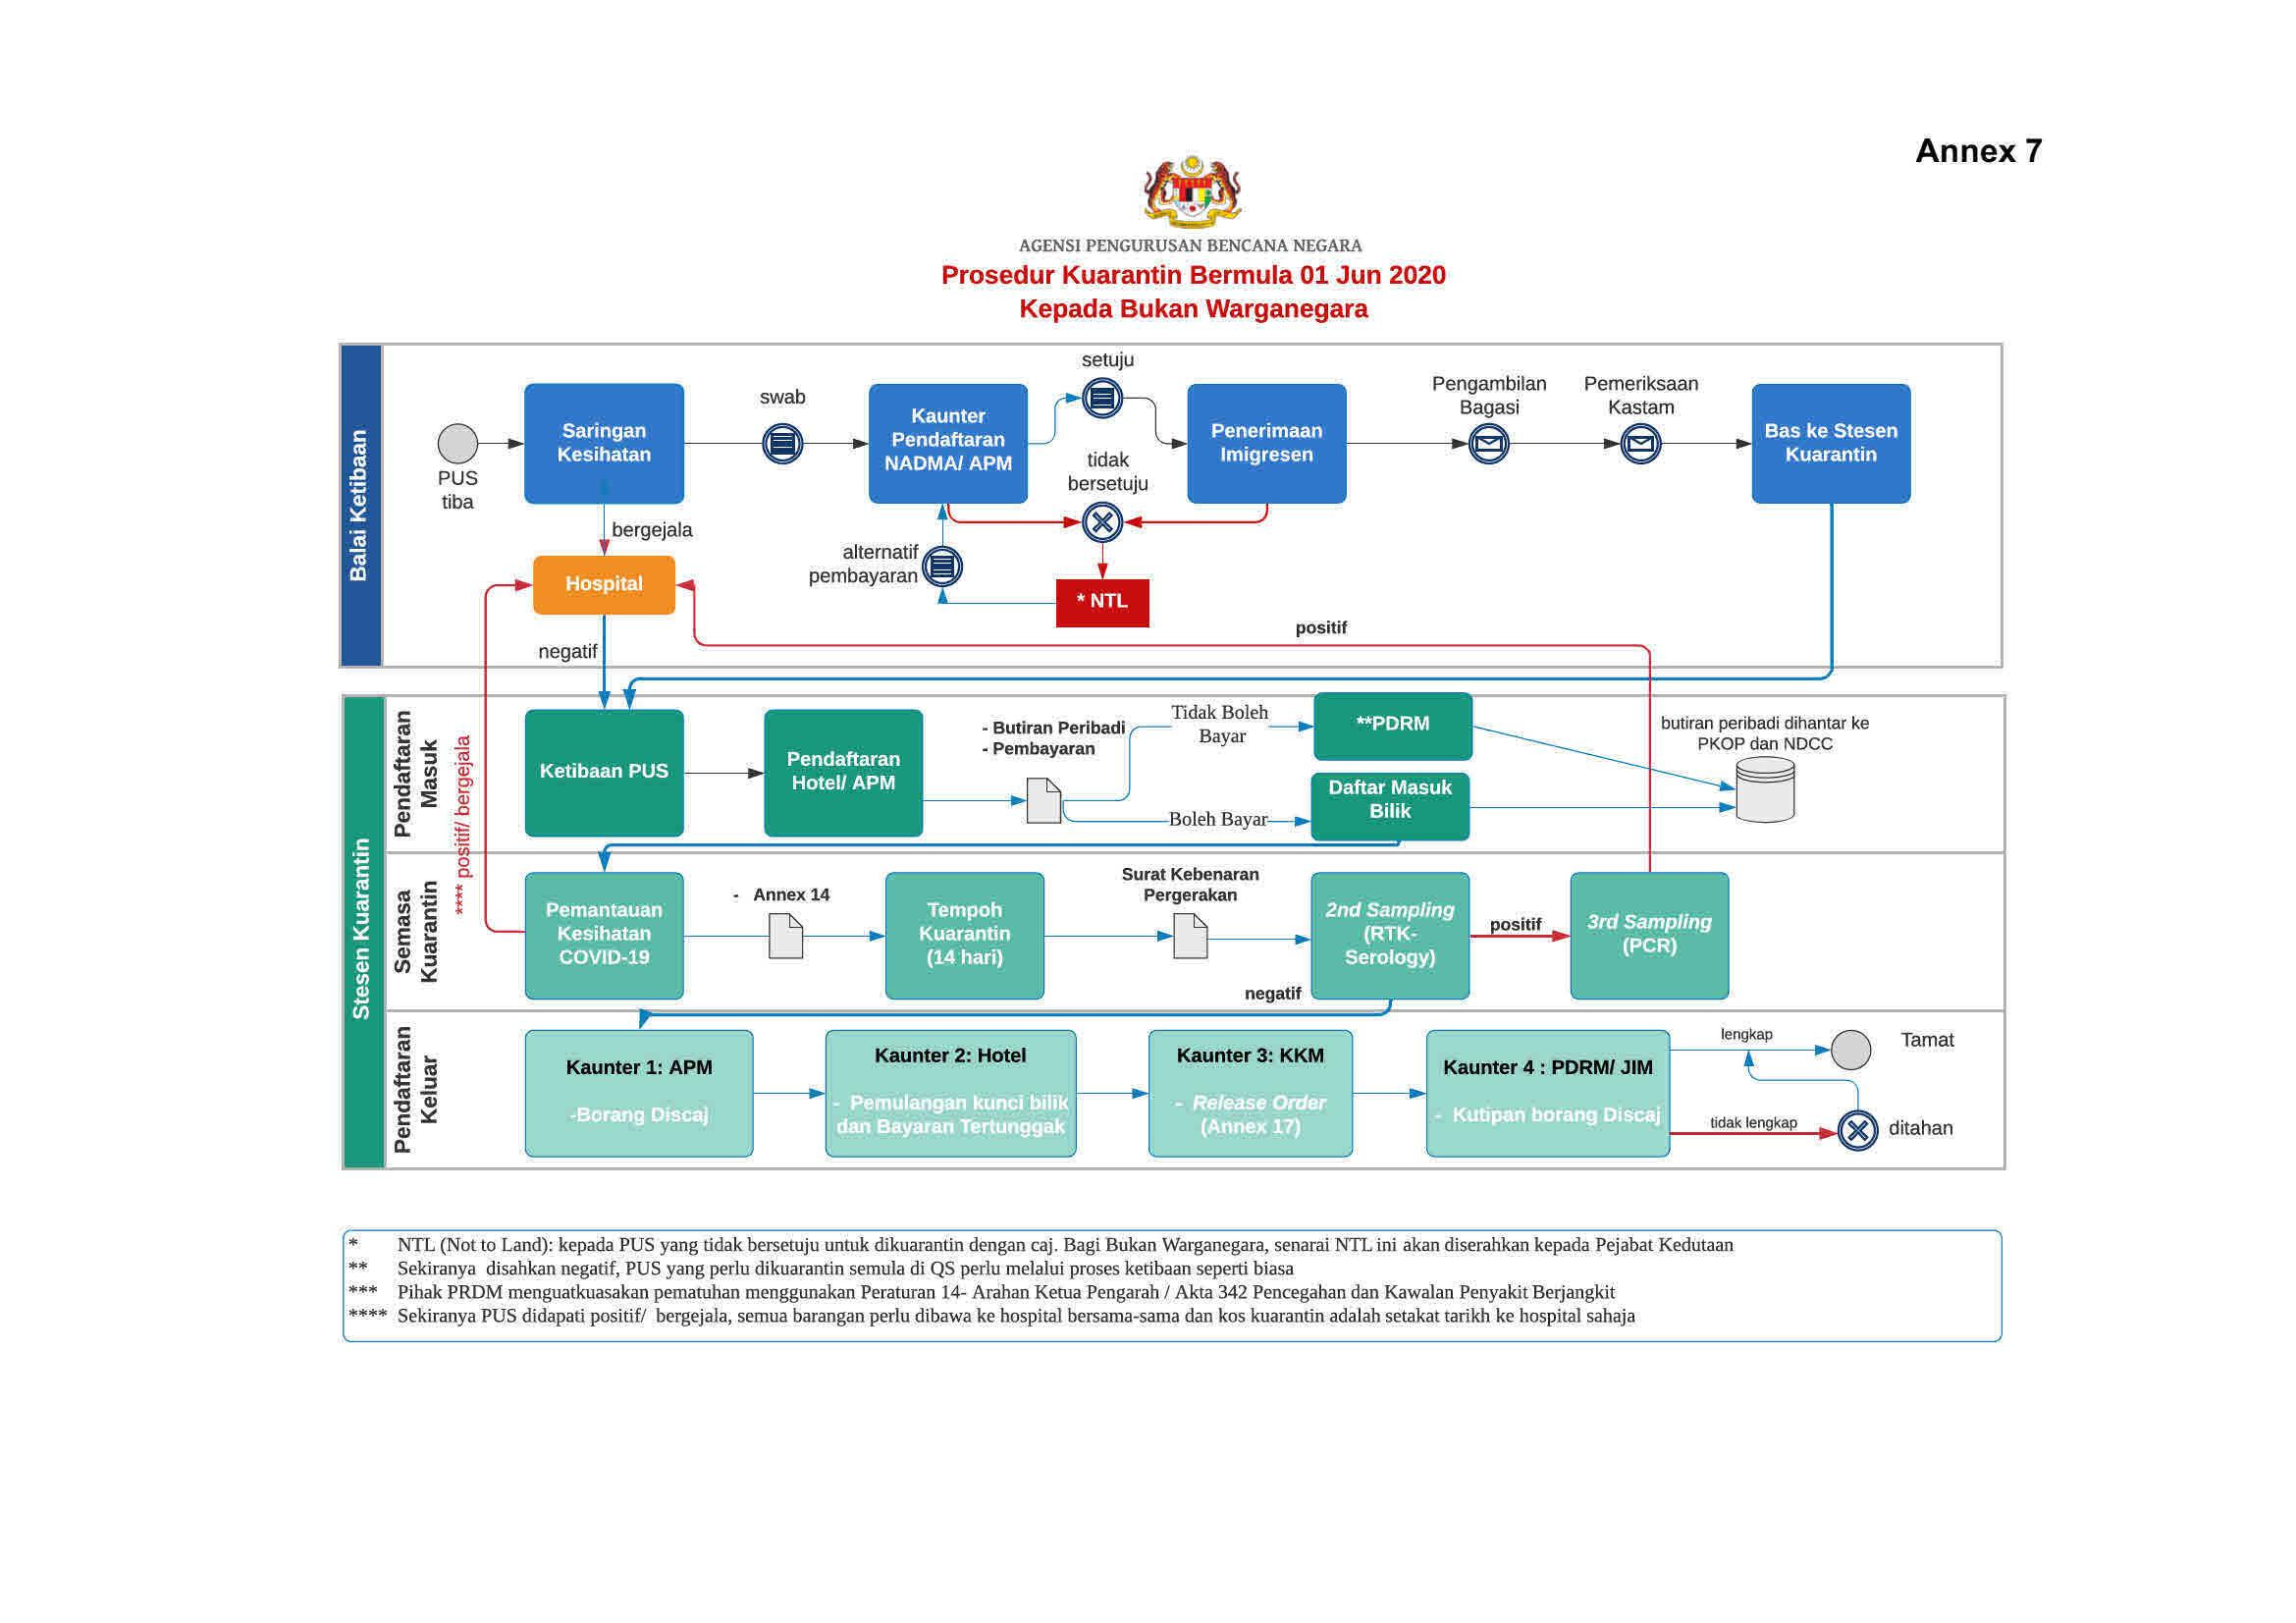 Konsulat Republik Indonesia Di Tawau Malaysia